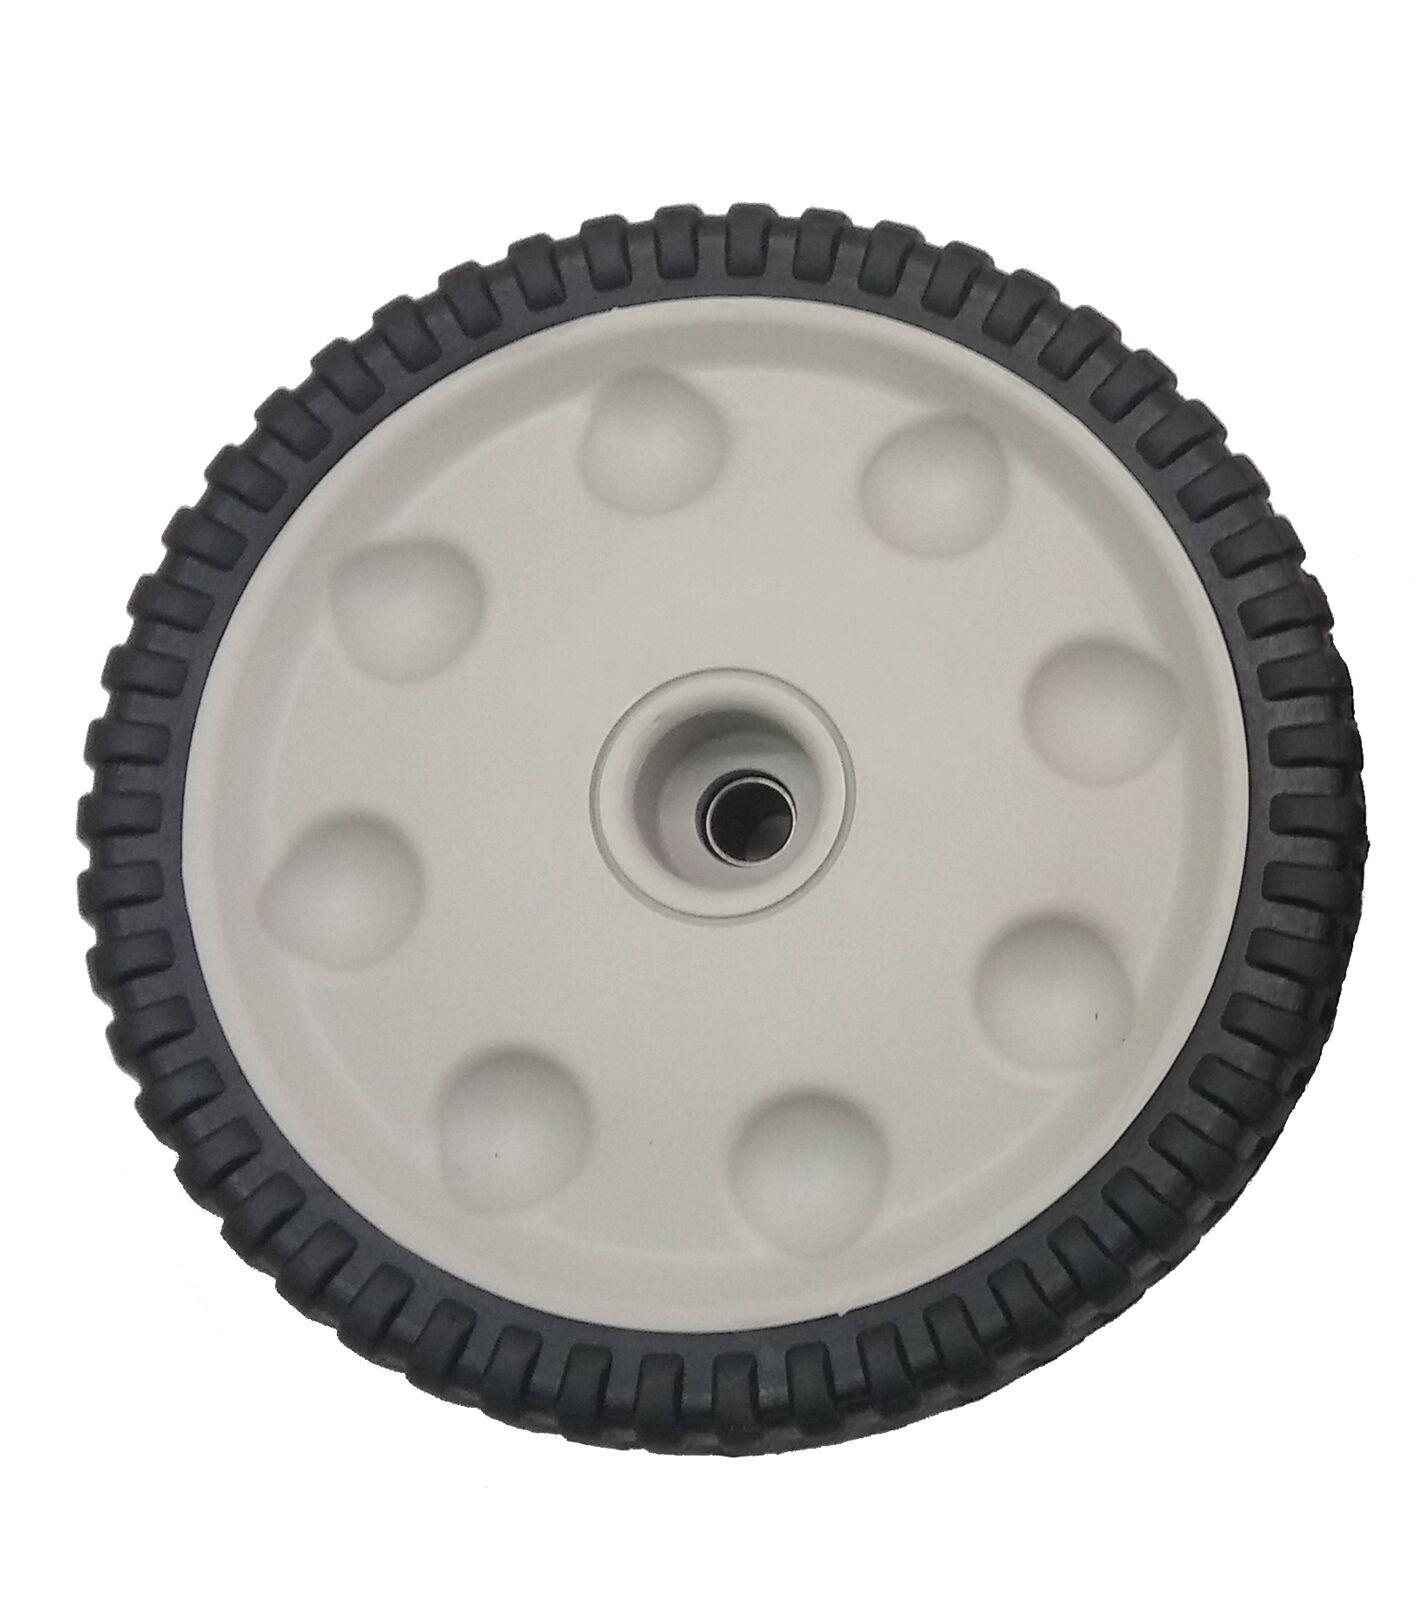 GENUINE 194231X460 583719501 401274X460 Wheels Craftsman Pack Husqvarna Drive 4